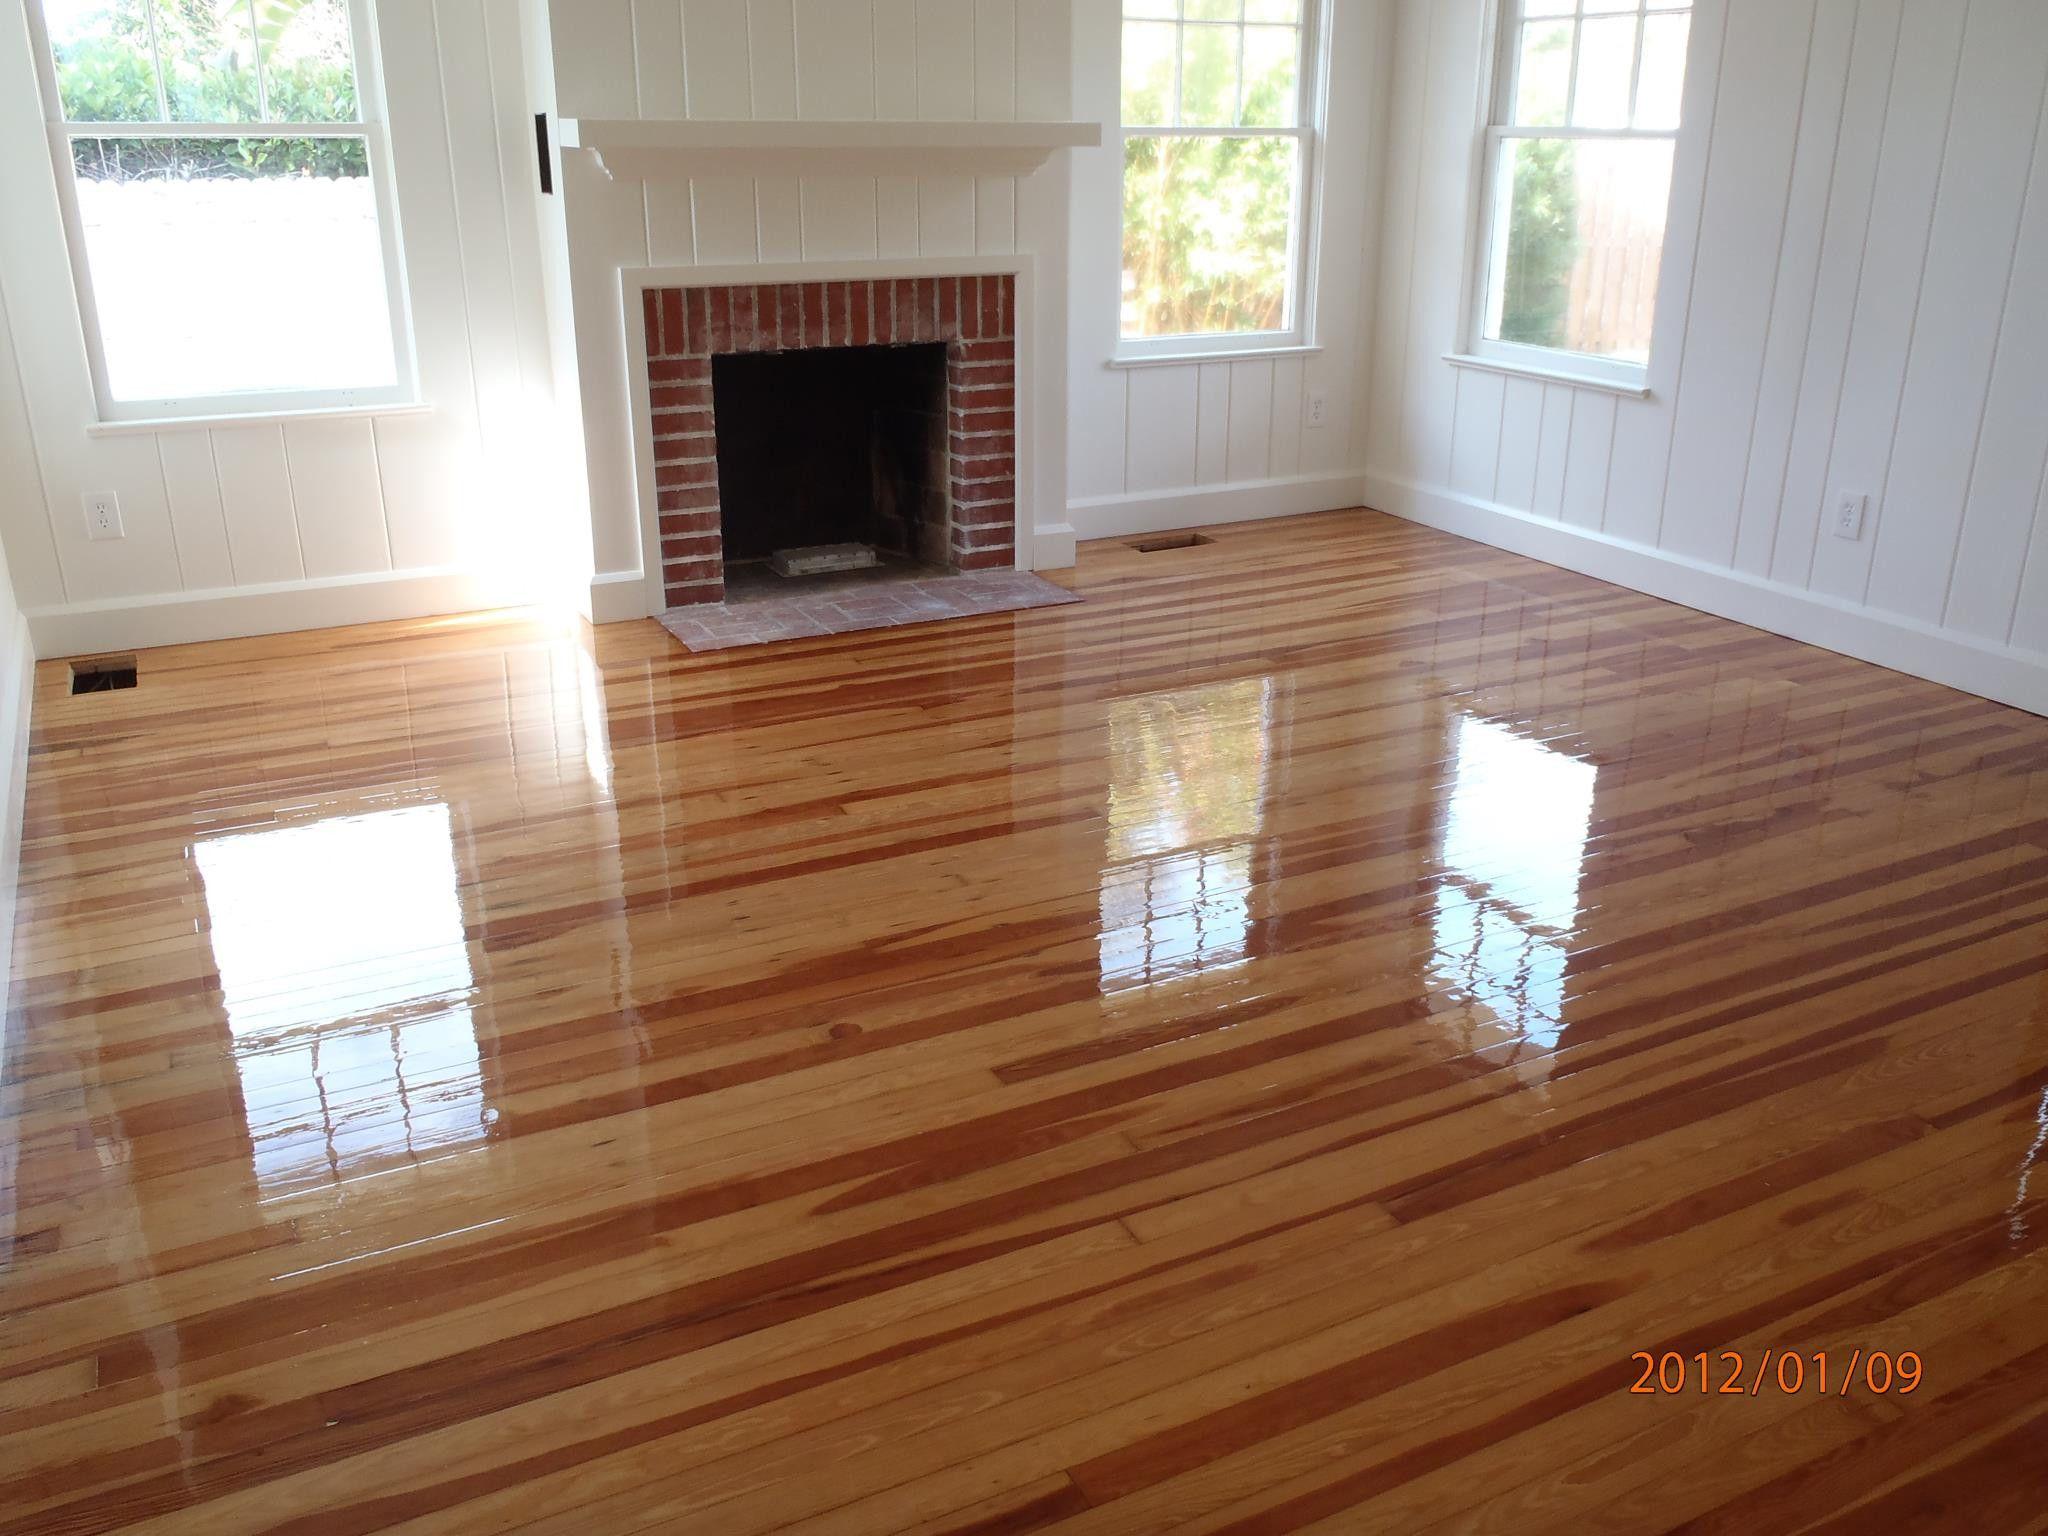 26 Cute Refinishing Hardwood Floors Yourself without